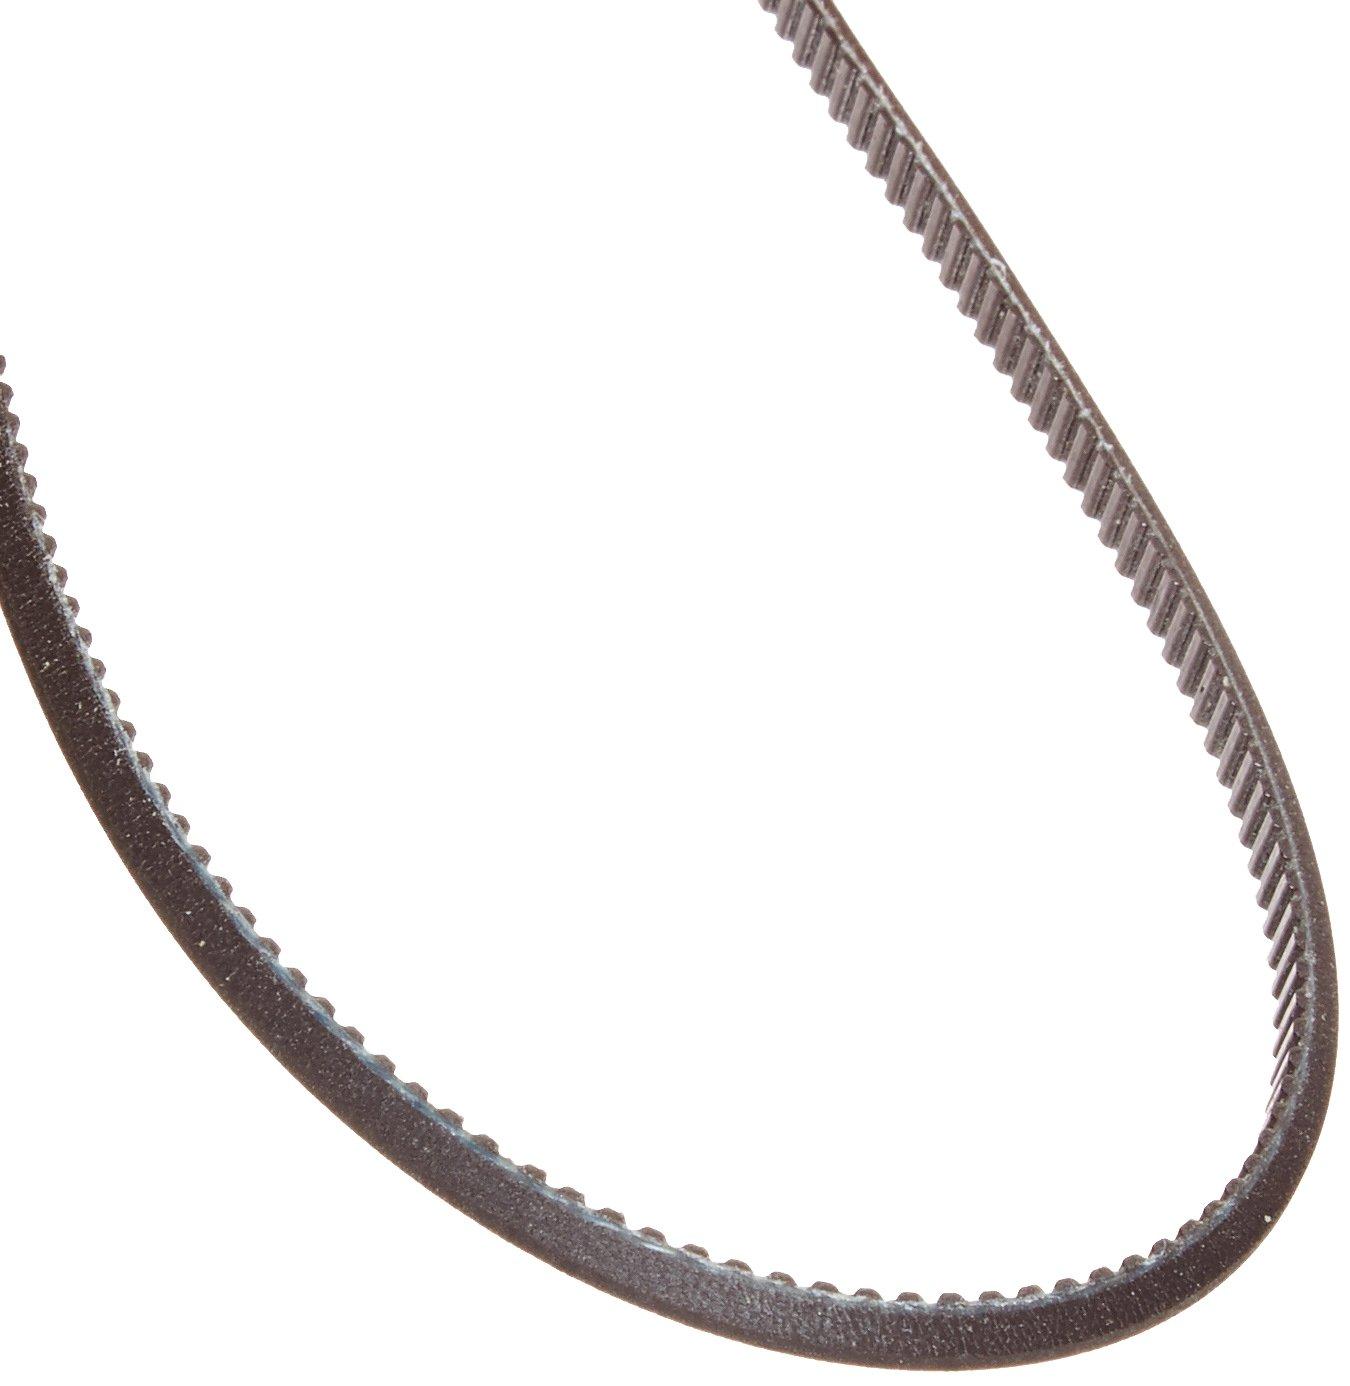 Standard 5M365 Gates Polyflex Belt